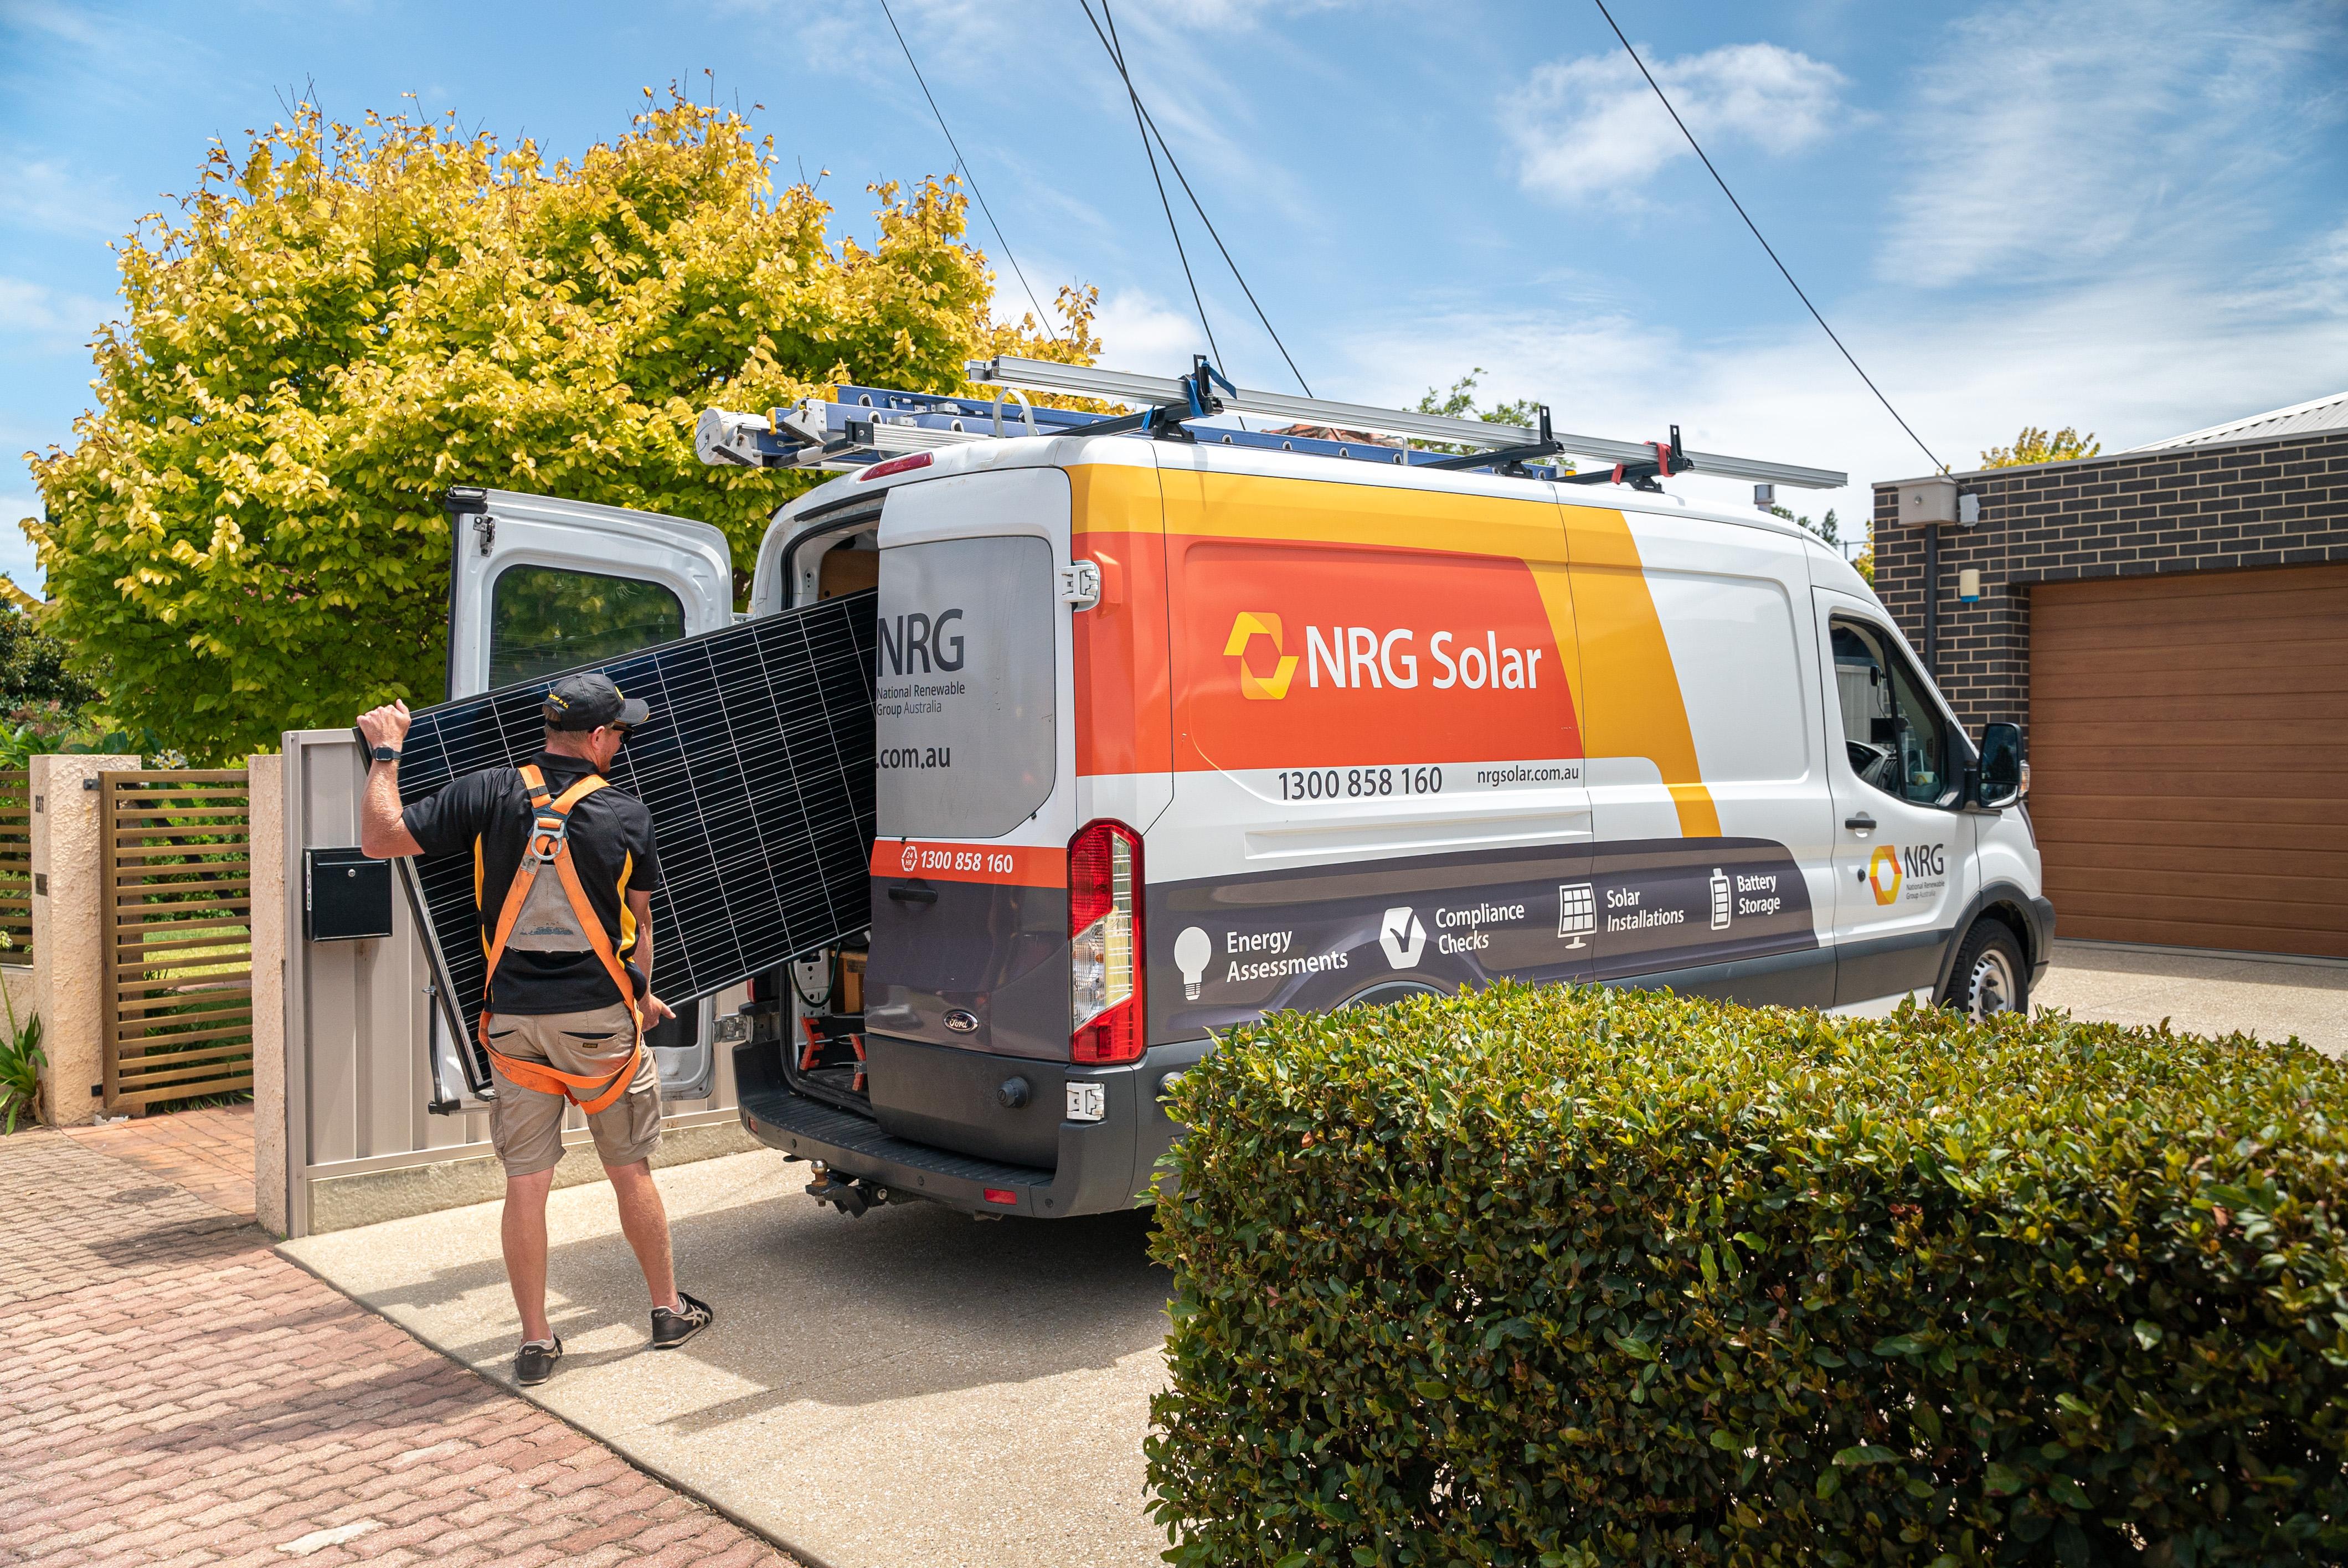 The NRG solar power van on the road